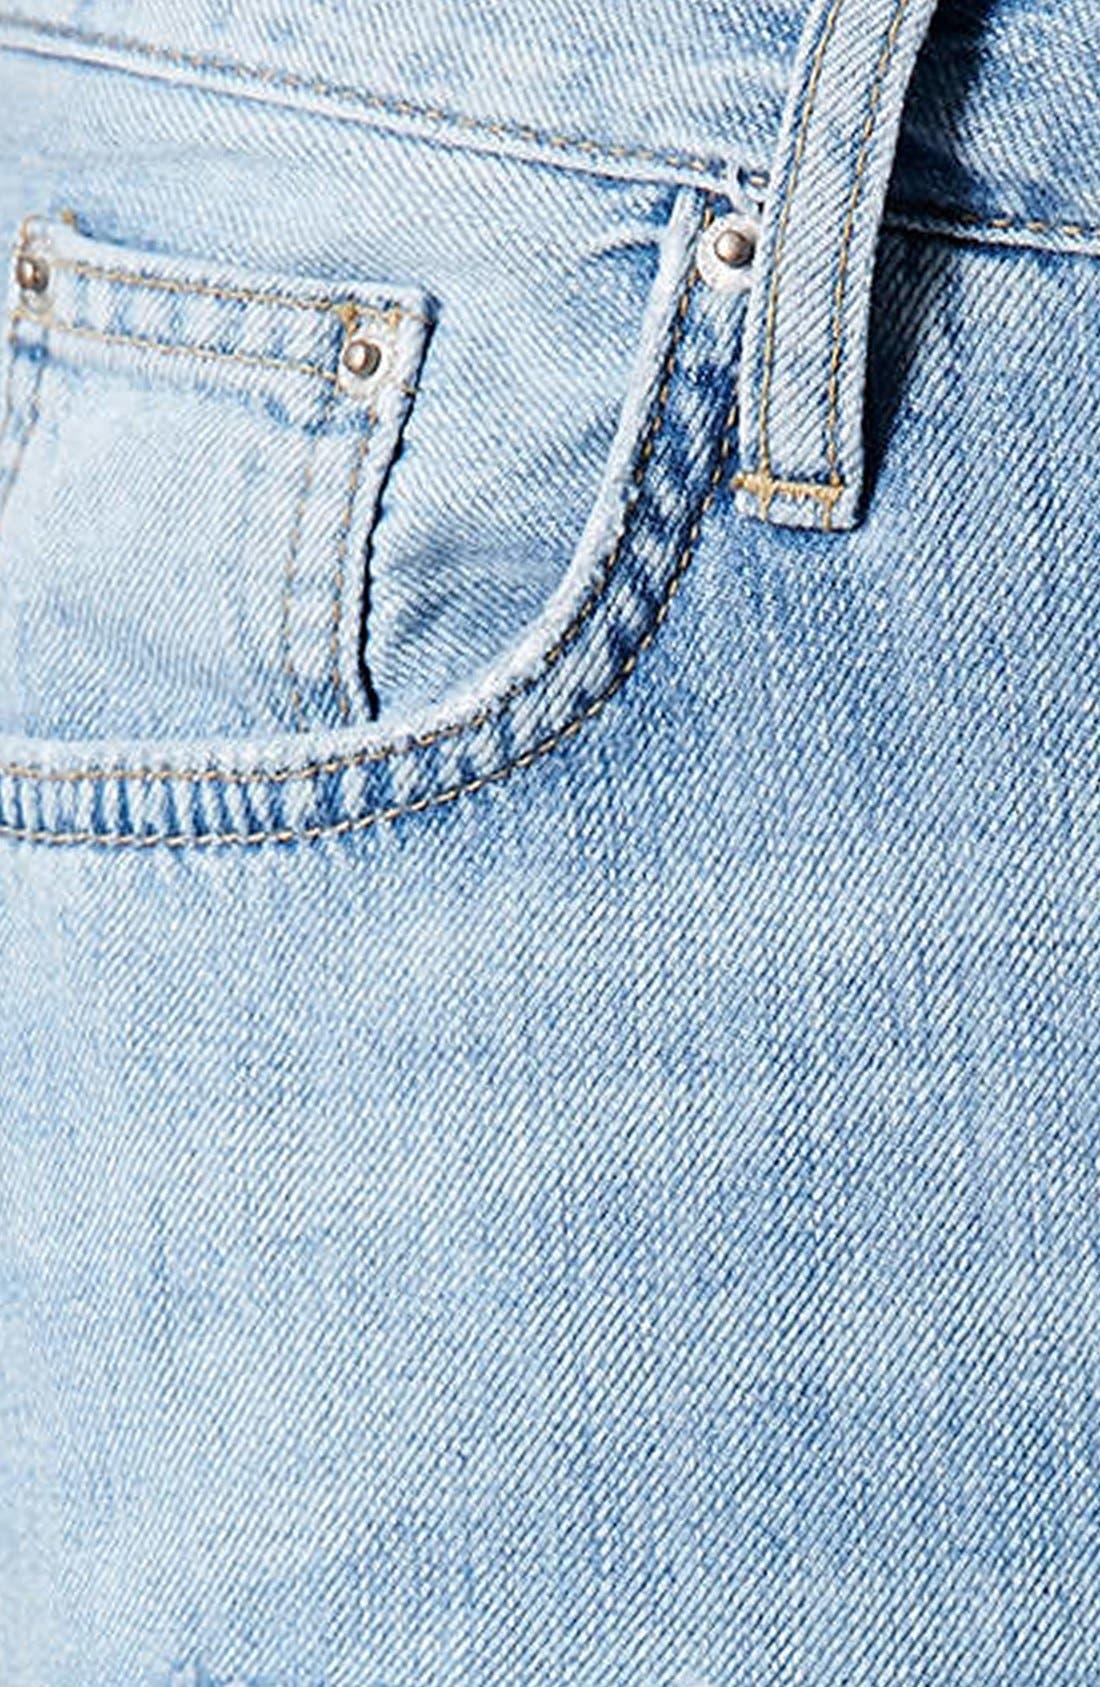 Alternate Image 4  - Topshop Moto Destroyed Boyfriend Jeans (Light Denim)